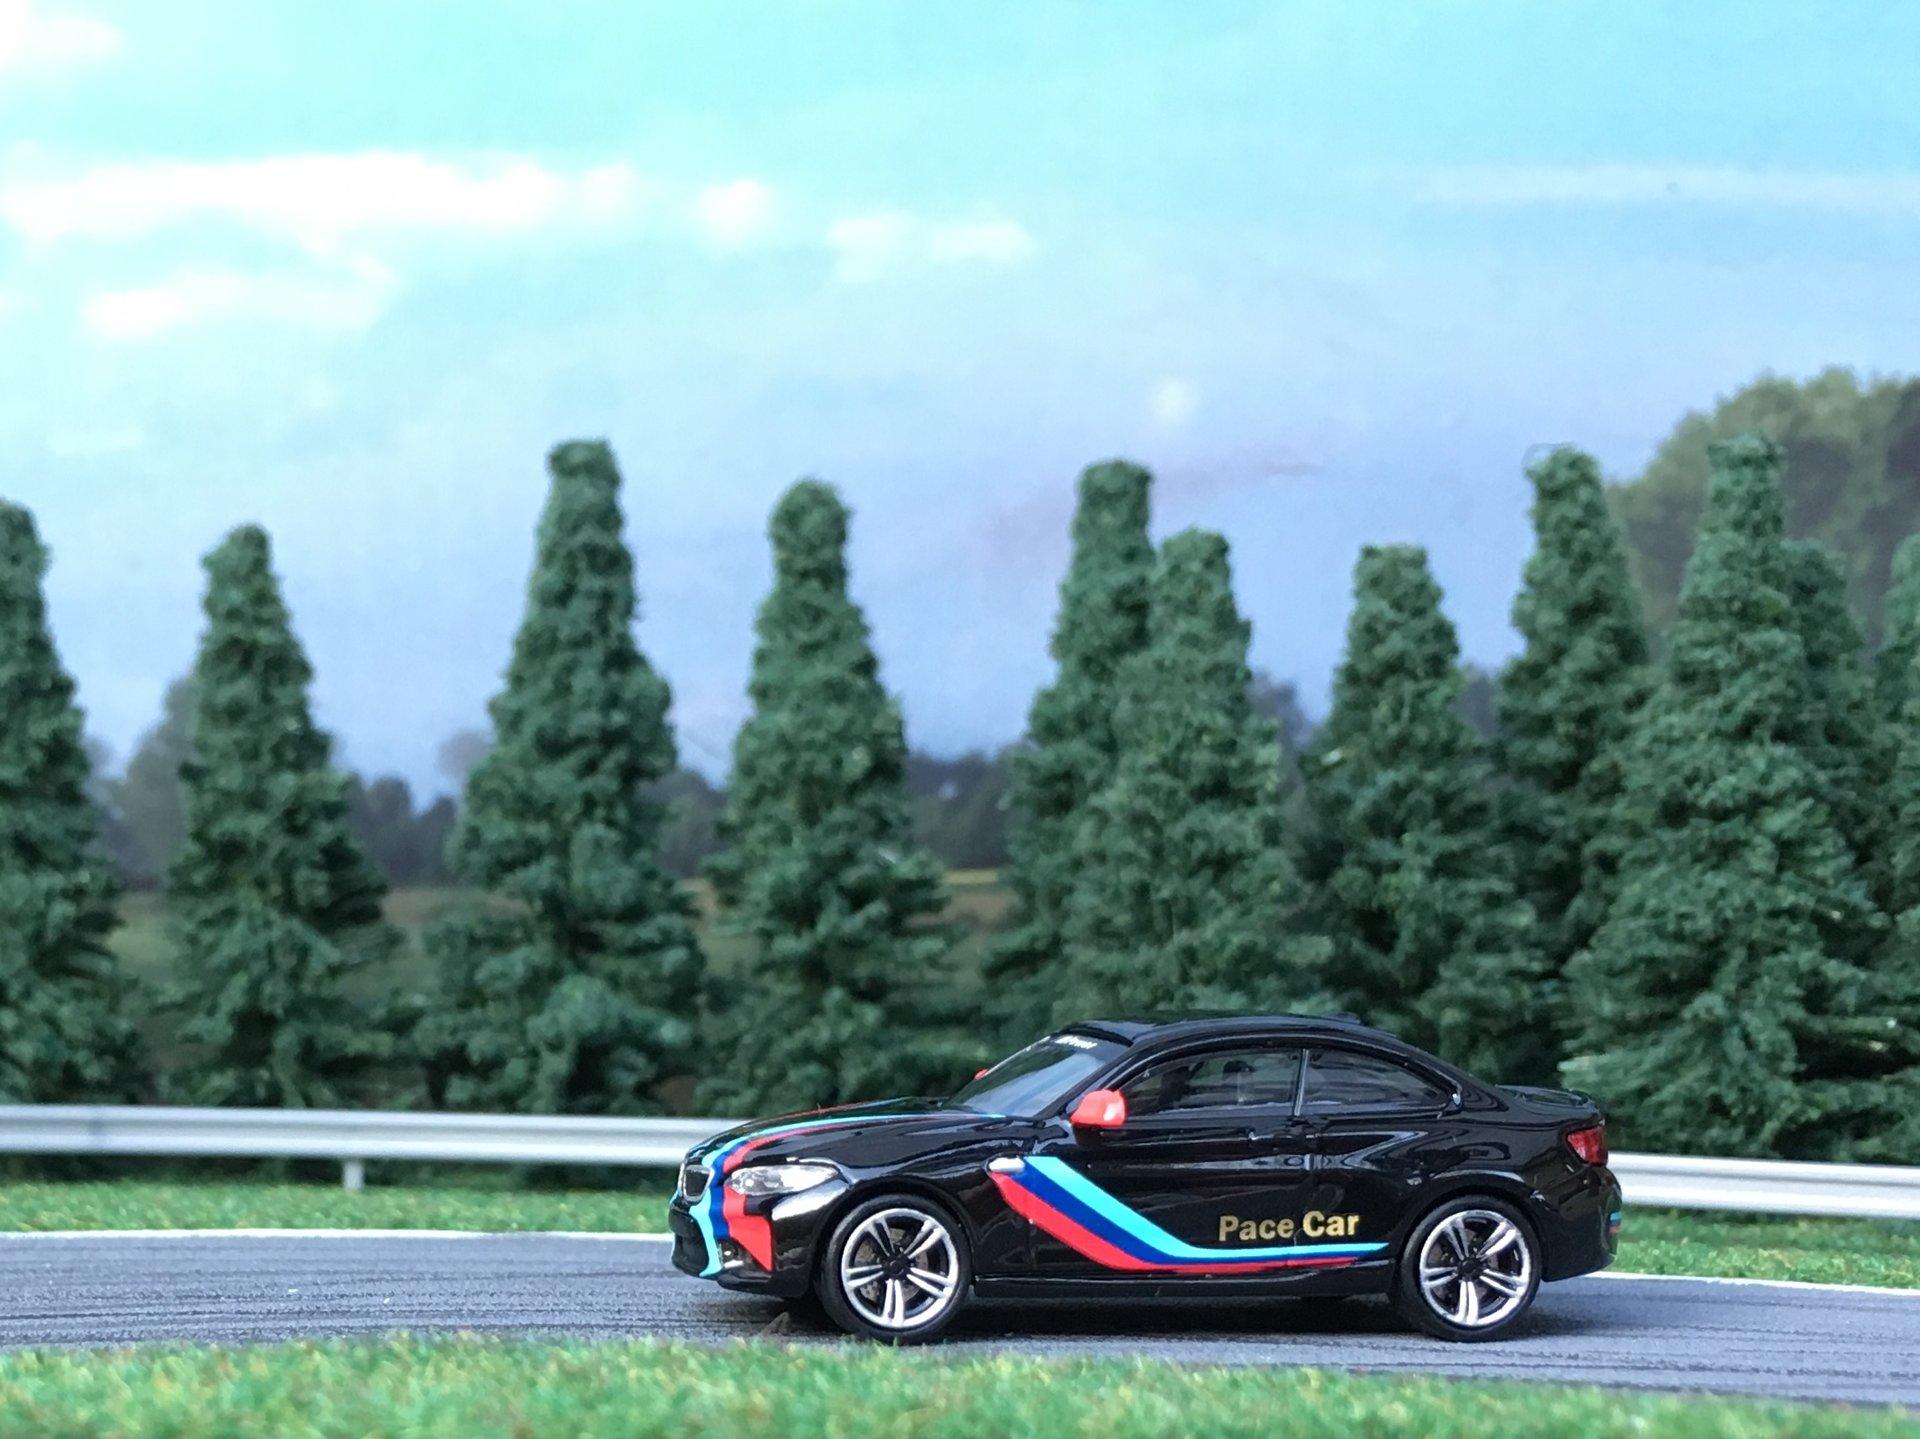 BMW M2 Pace car 001.jpg